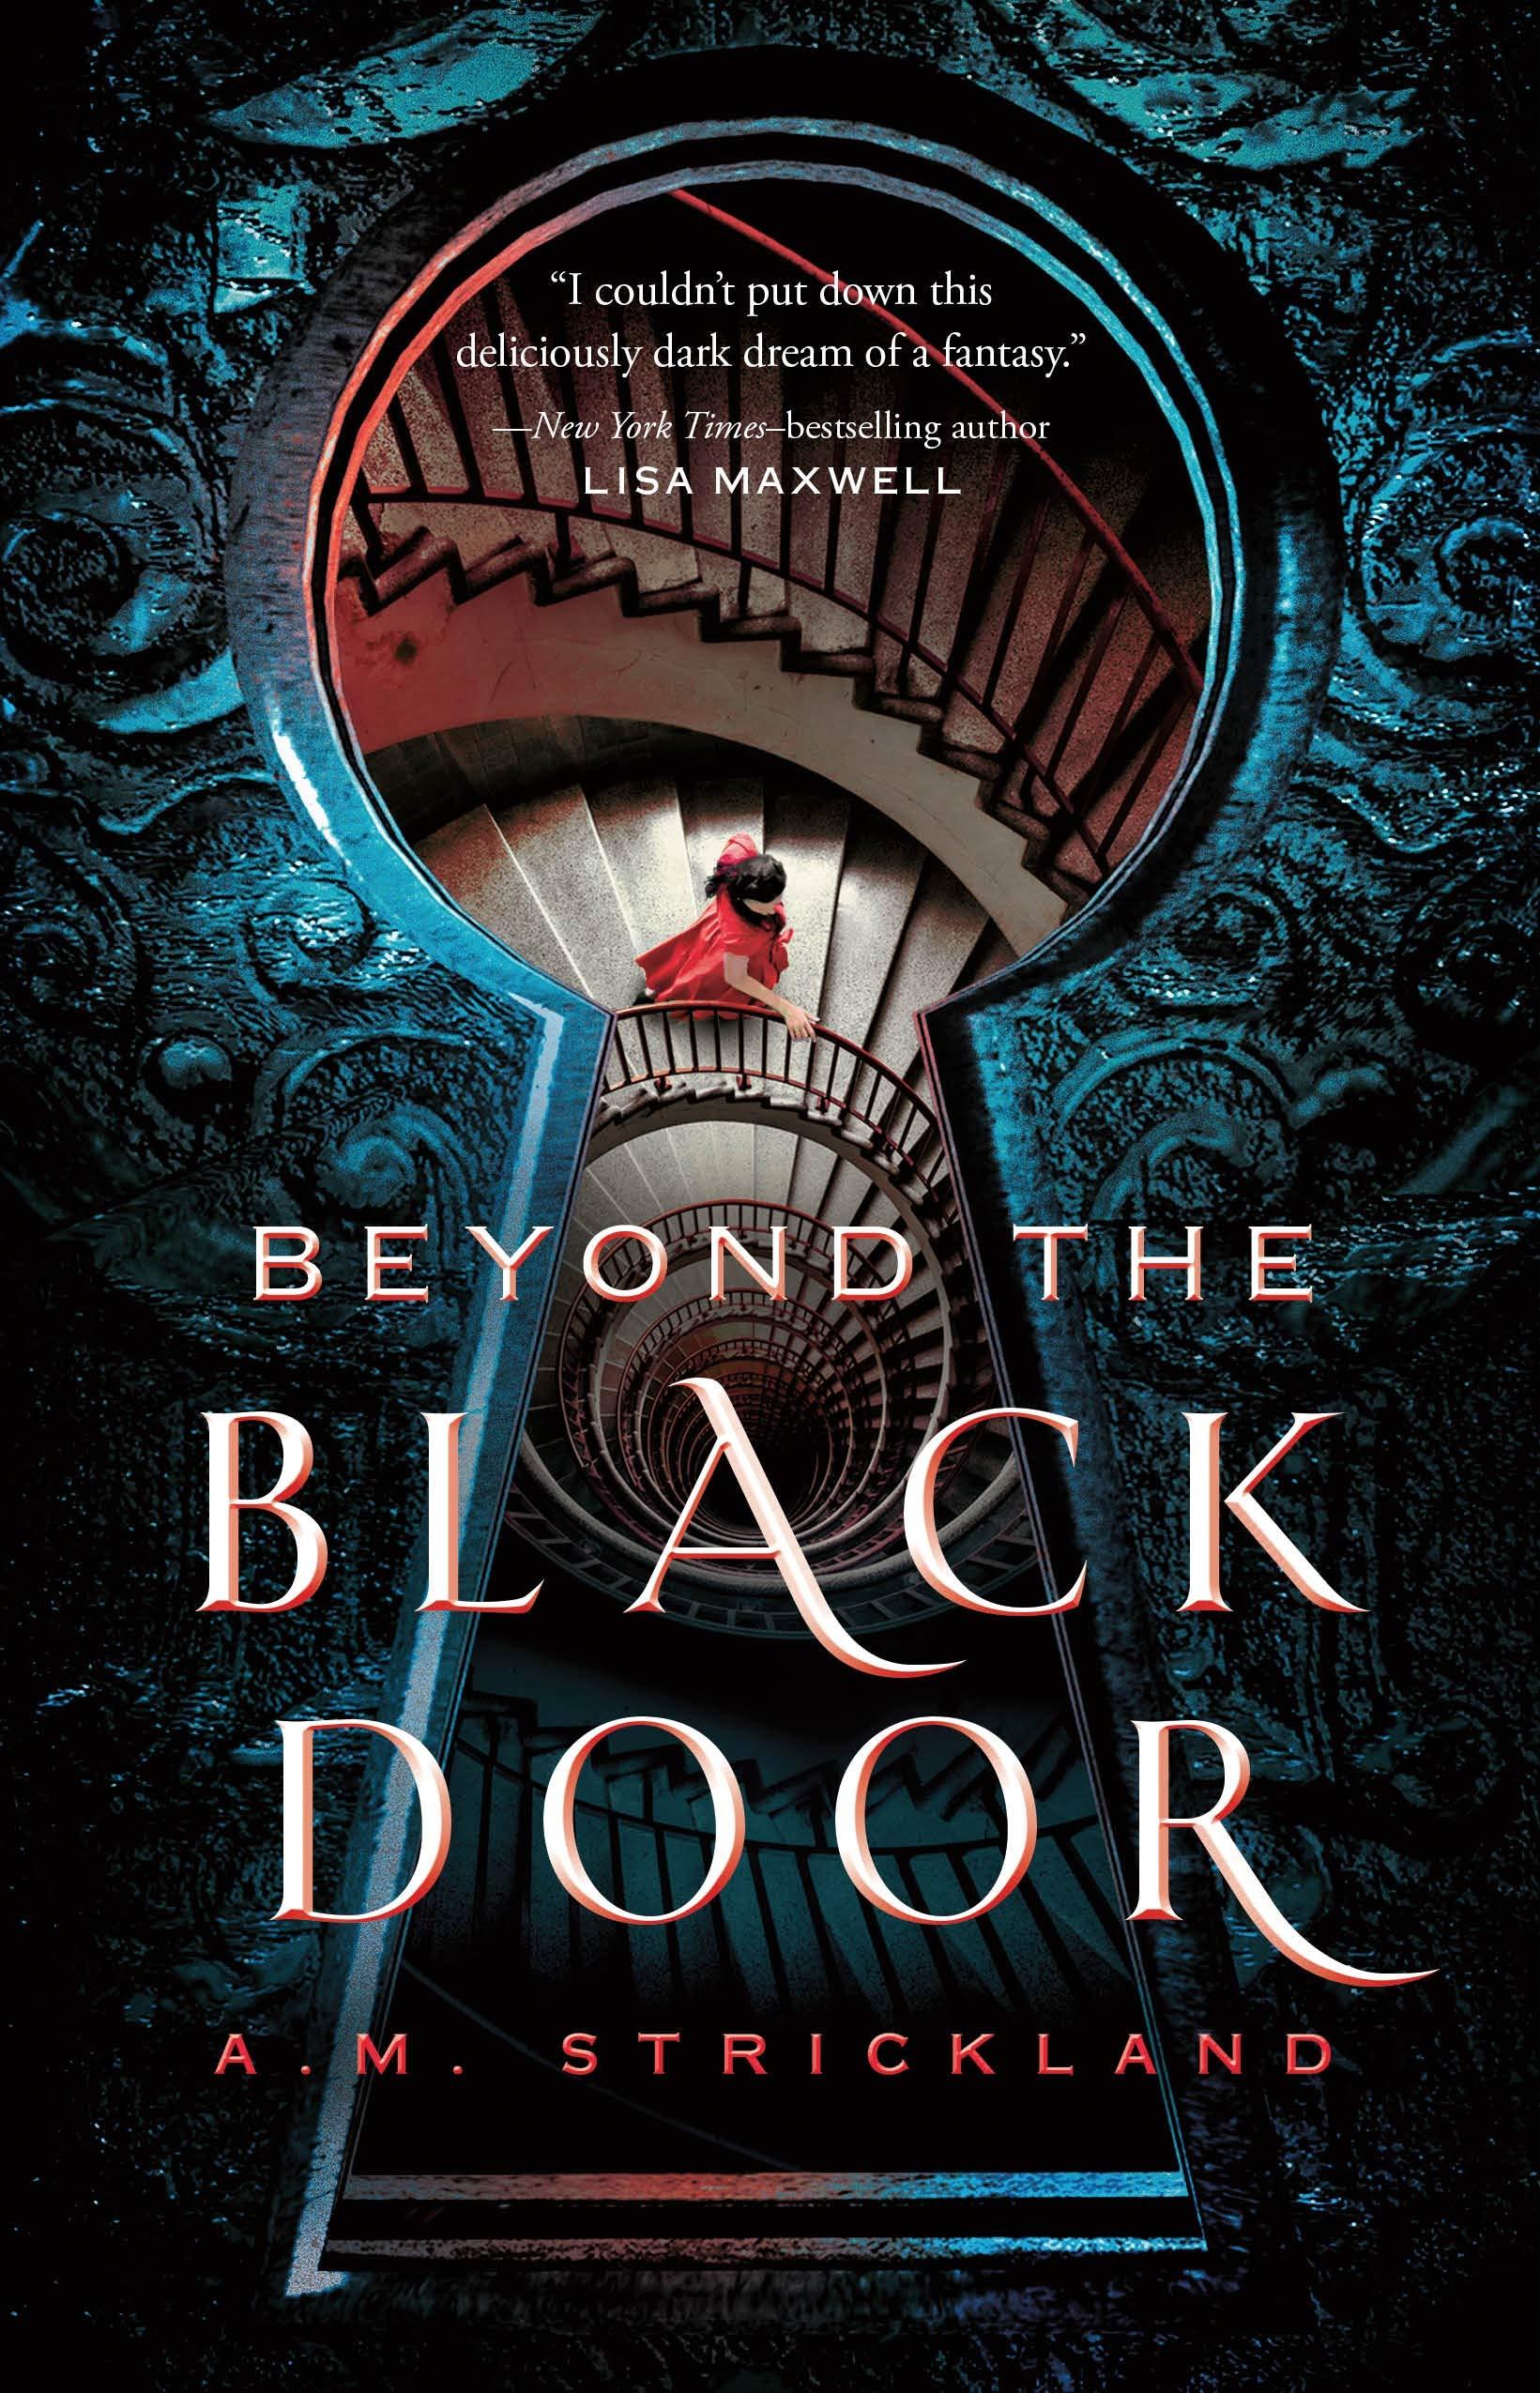 Amazon.com: Beyond the Black Door (9781250198747): Strickland, A.M.: Books